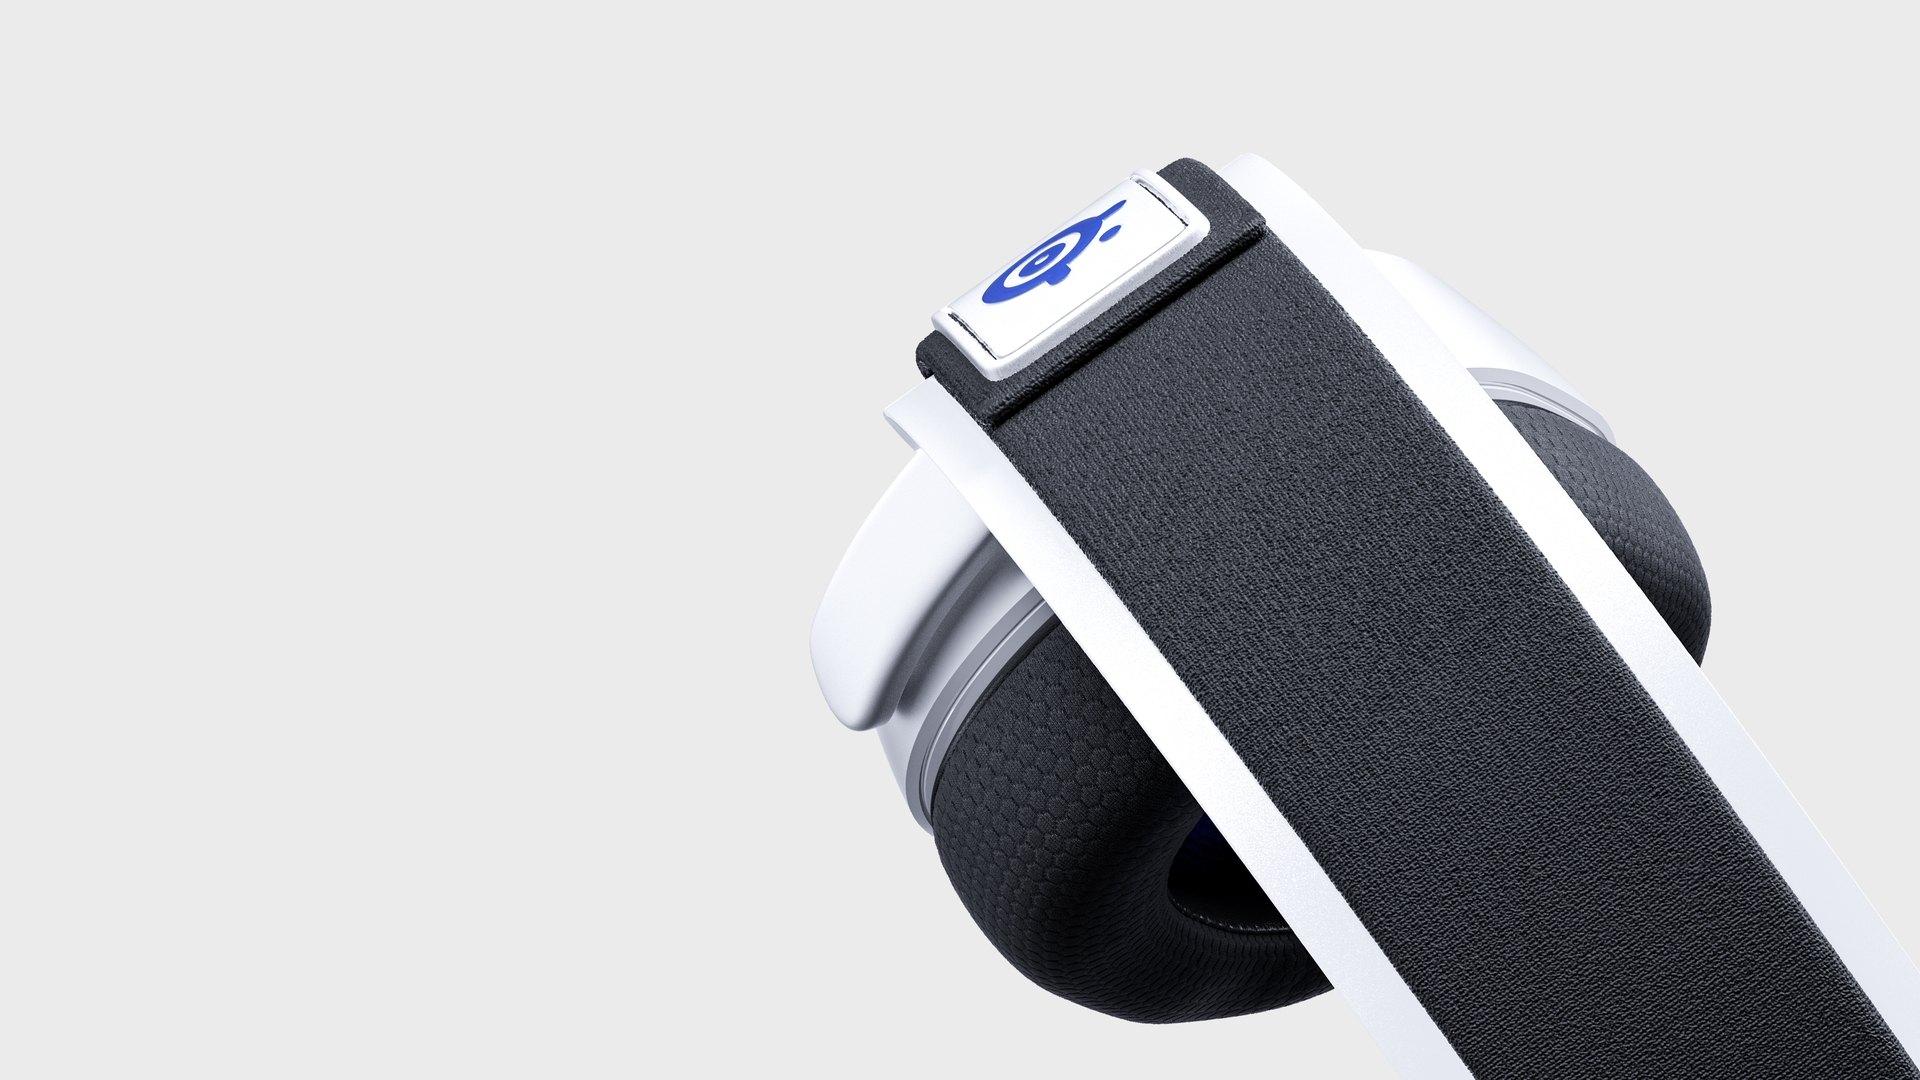 Tai nghe Steelseries Arctis 7P White WL HS-00021 - 61467 có thiết kế gọng kim loại cao cấp